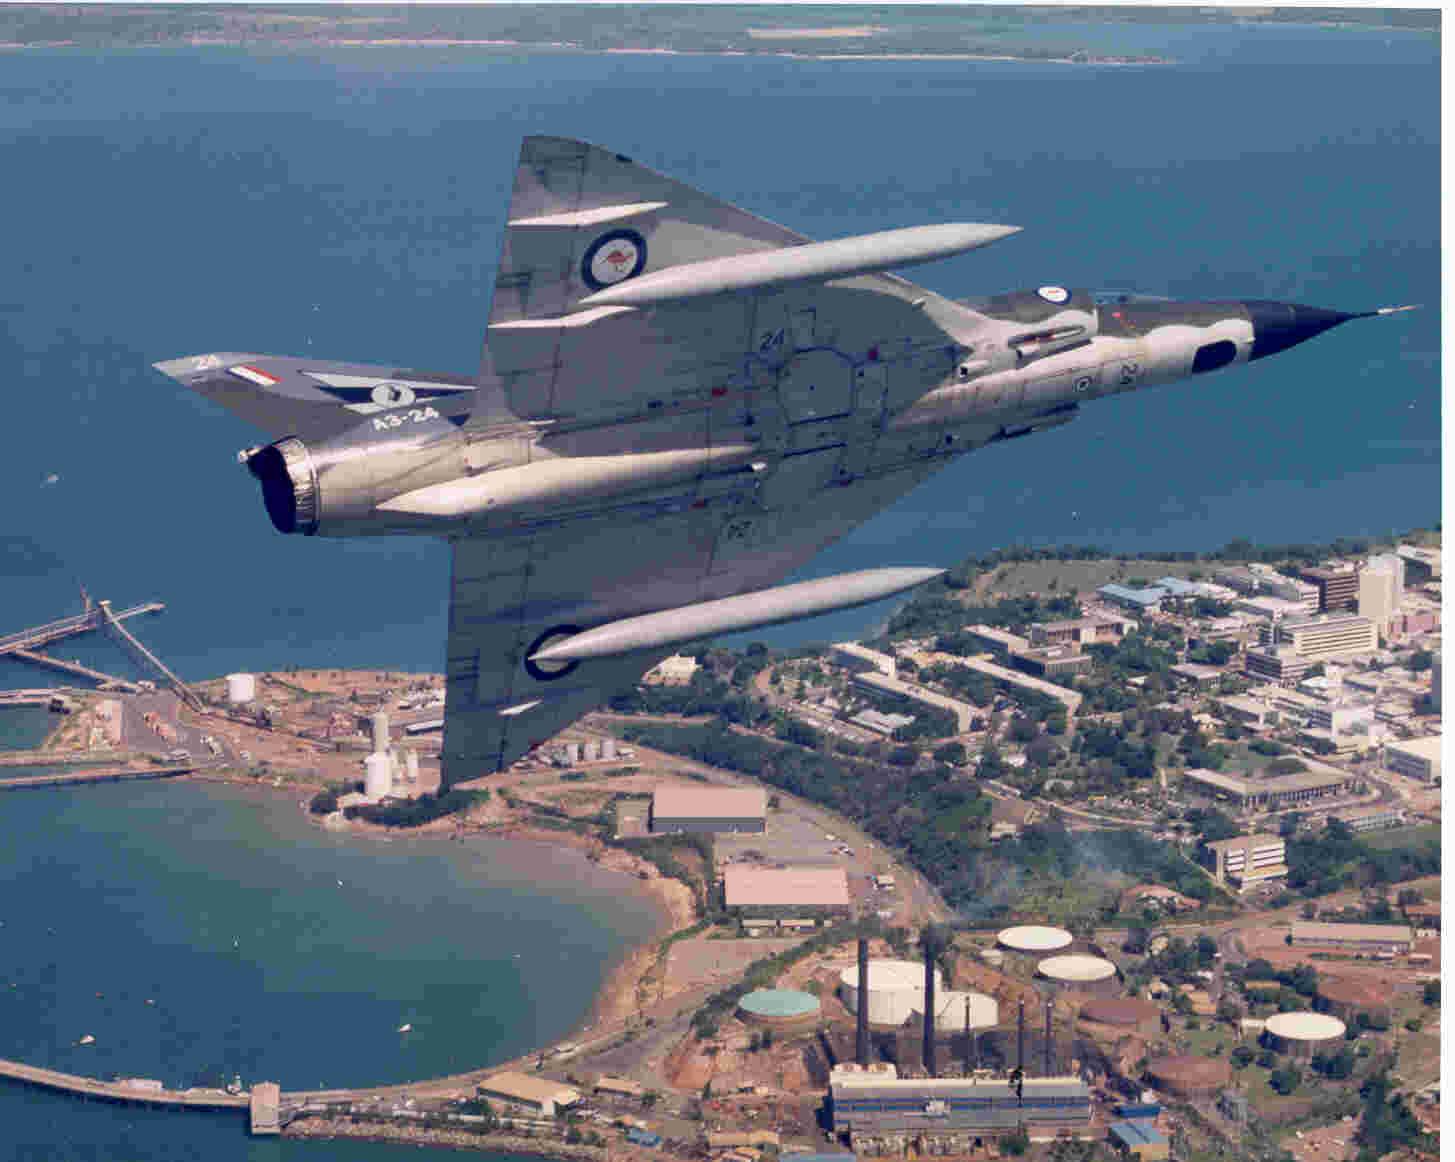 Dassualt Mirage III O of 75 Sqn over Darwin